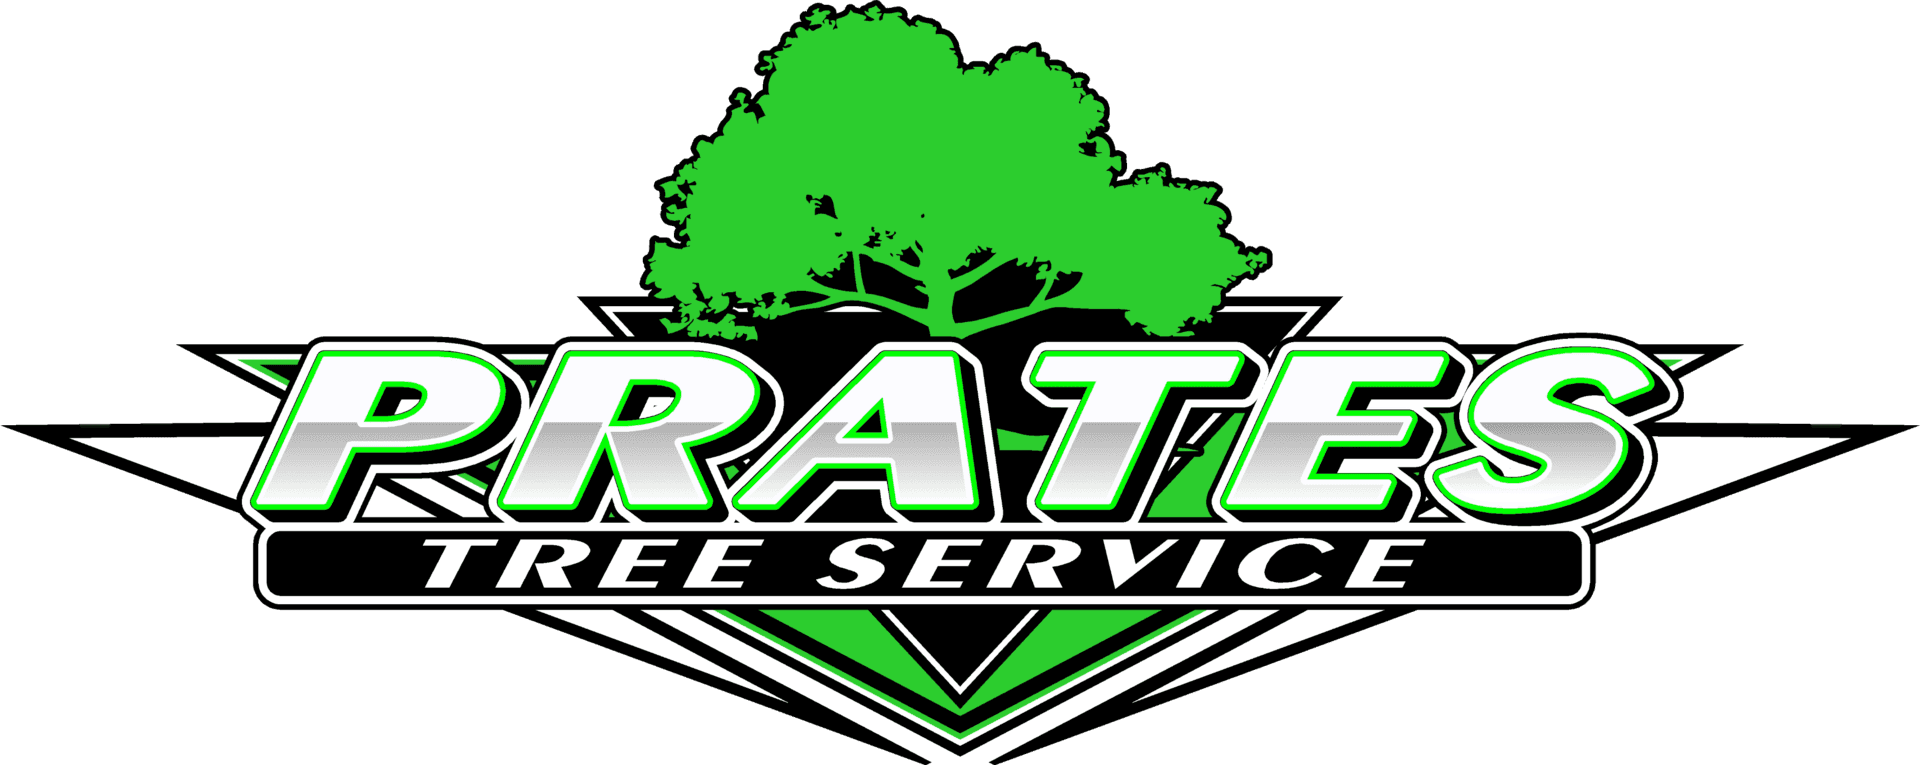 Prate's Tree Service   Logo